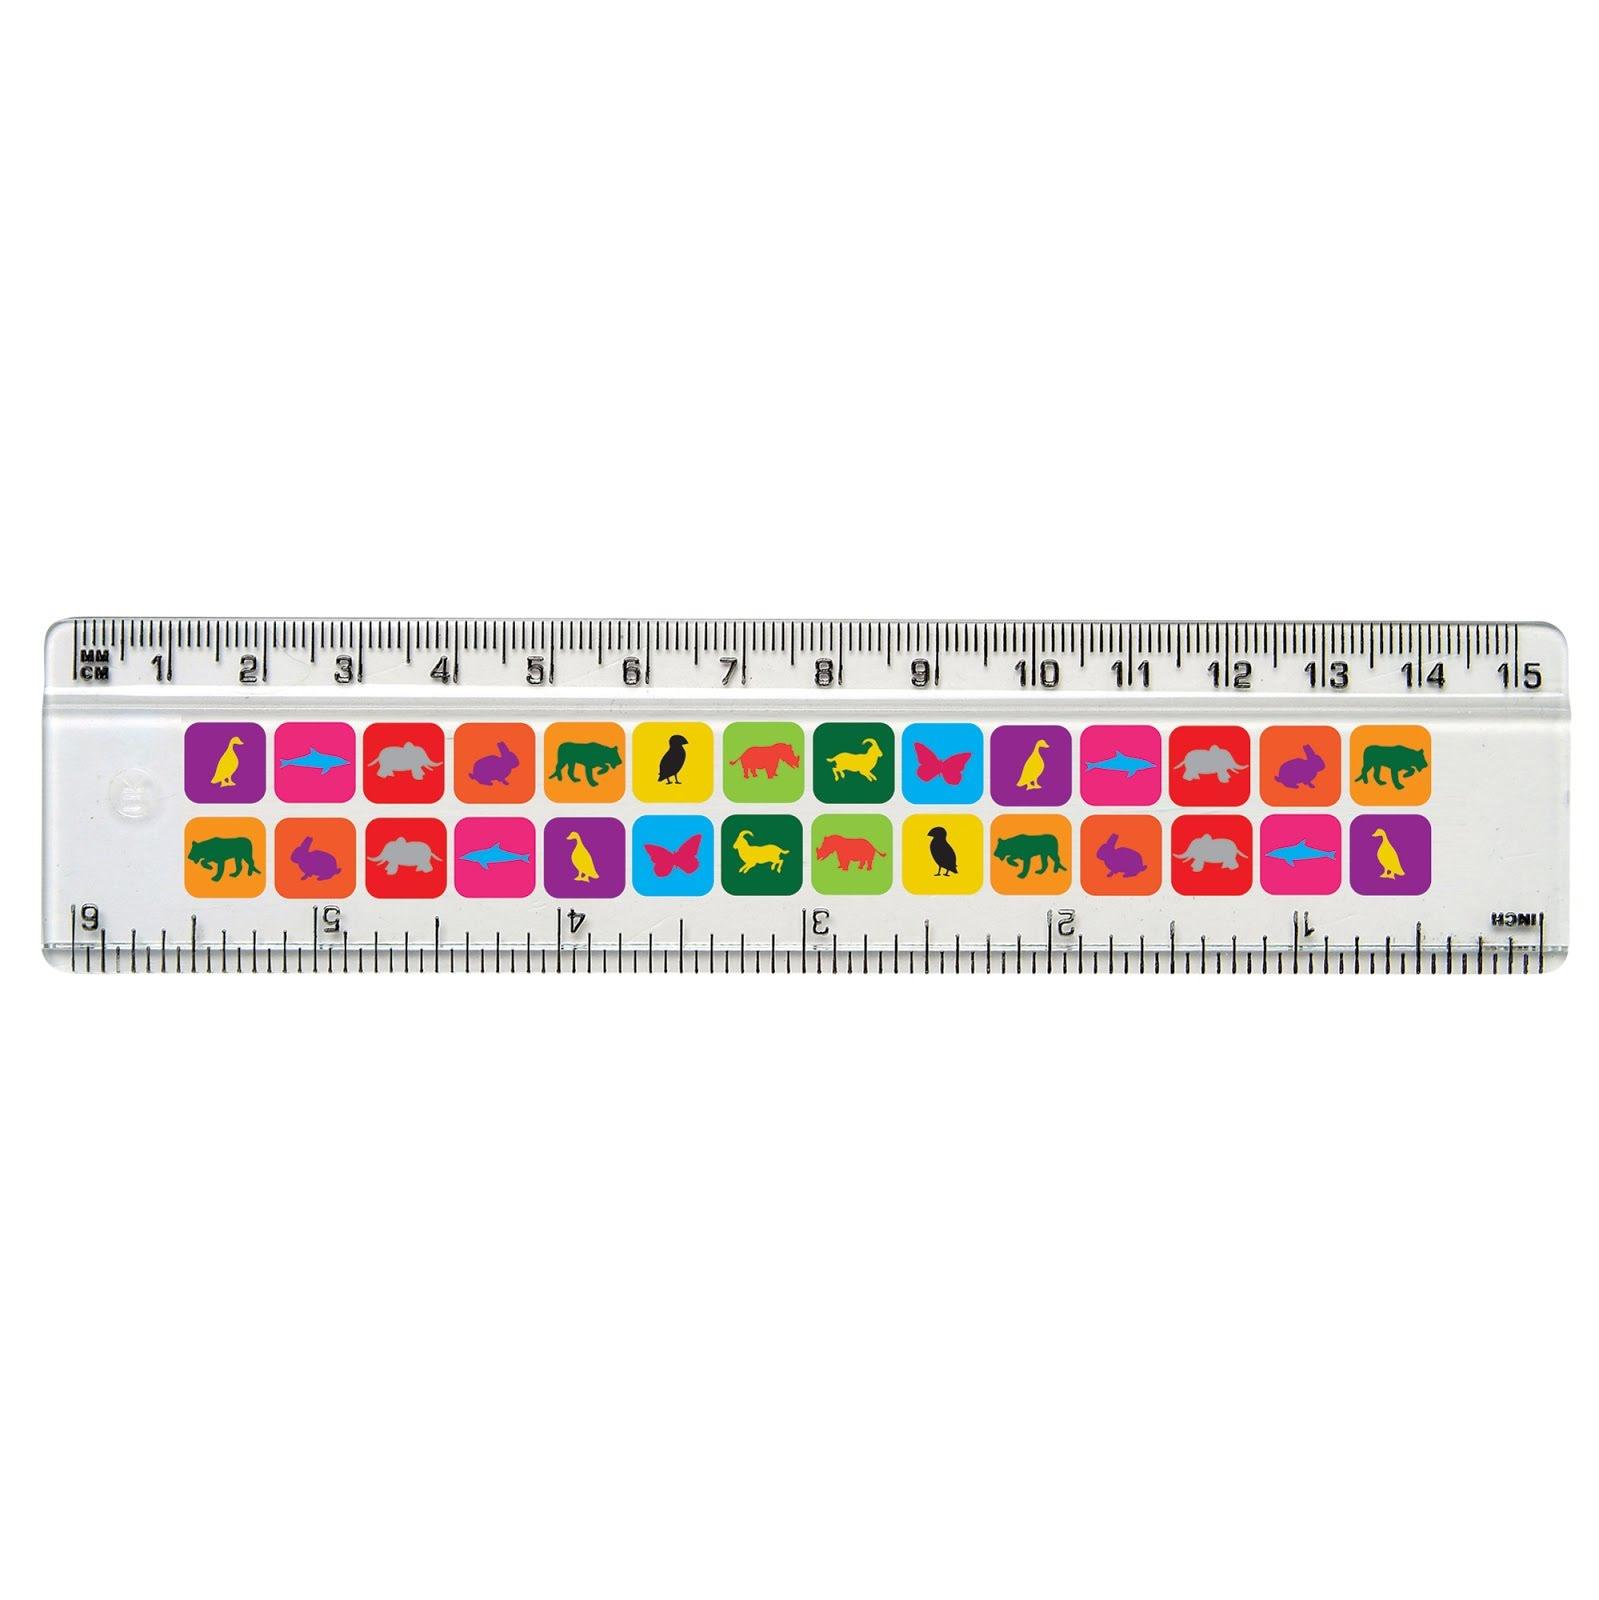 Colourful Rulers - 15cm